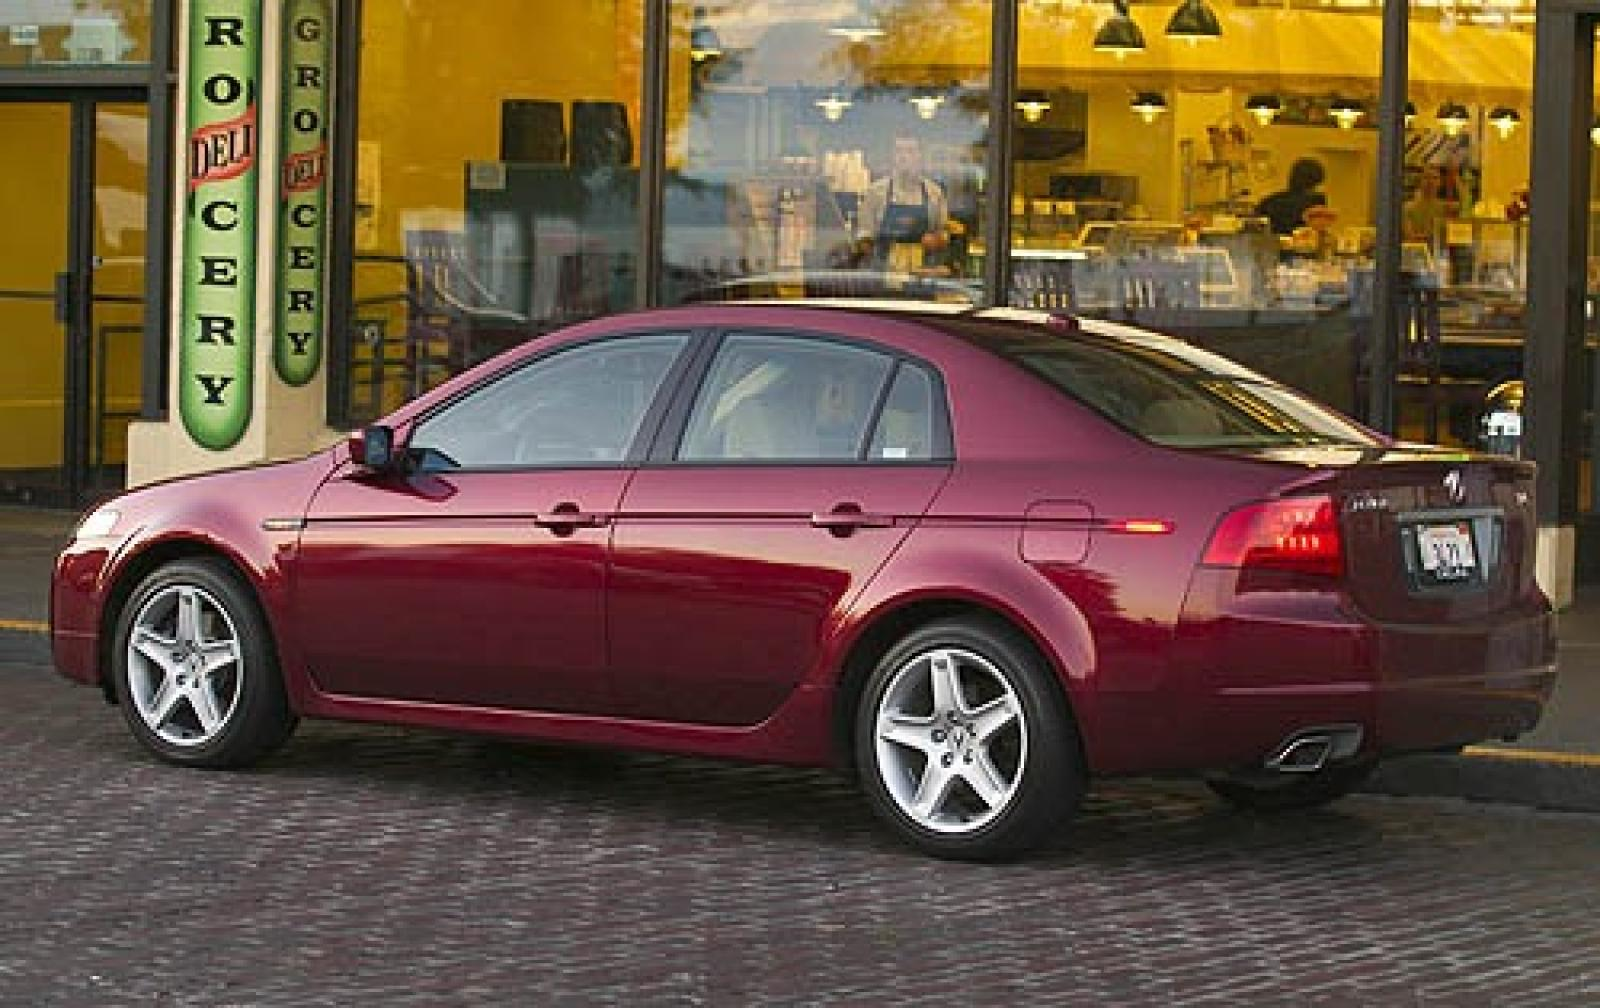 Acura TL Information And Photos ZombieDrive - Acura tl 2004 interior